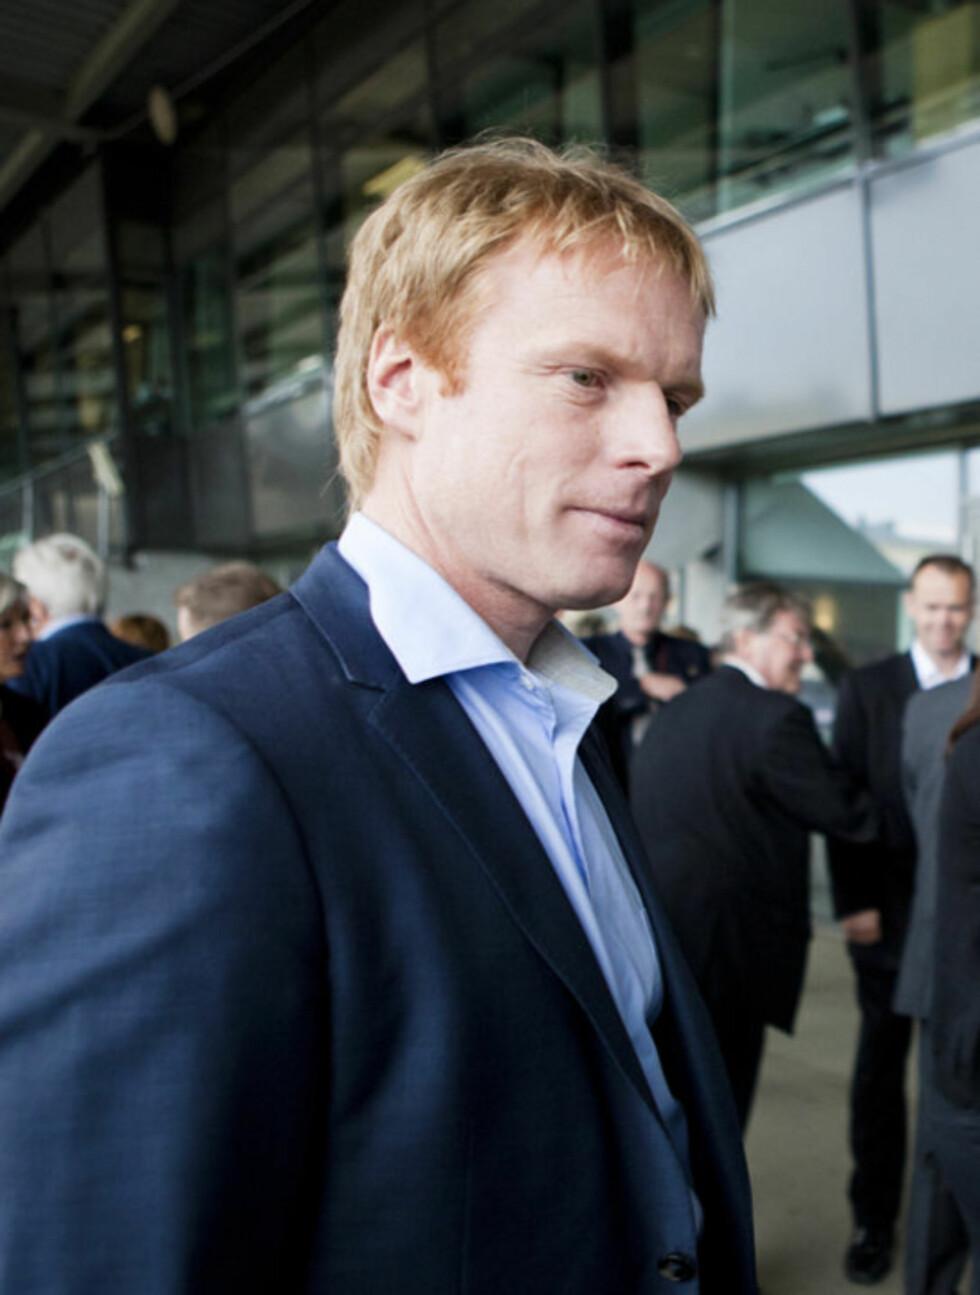 TIL STEDE: Bjørn Dæhlie snakket med Jack Waitz etter minnesmarkeringen for Grete Waitz på Bislett Stadion i Oslo onsdag. Foto: Scanpix